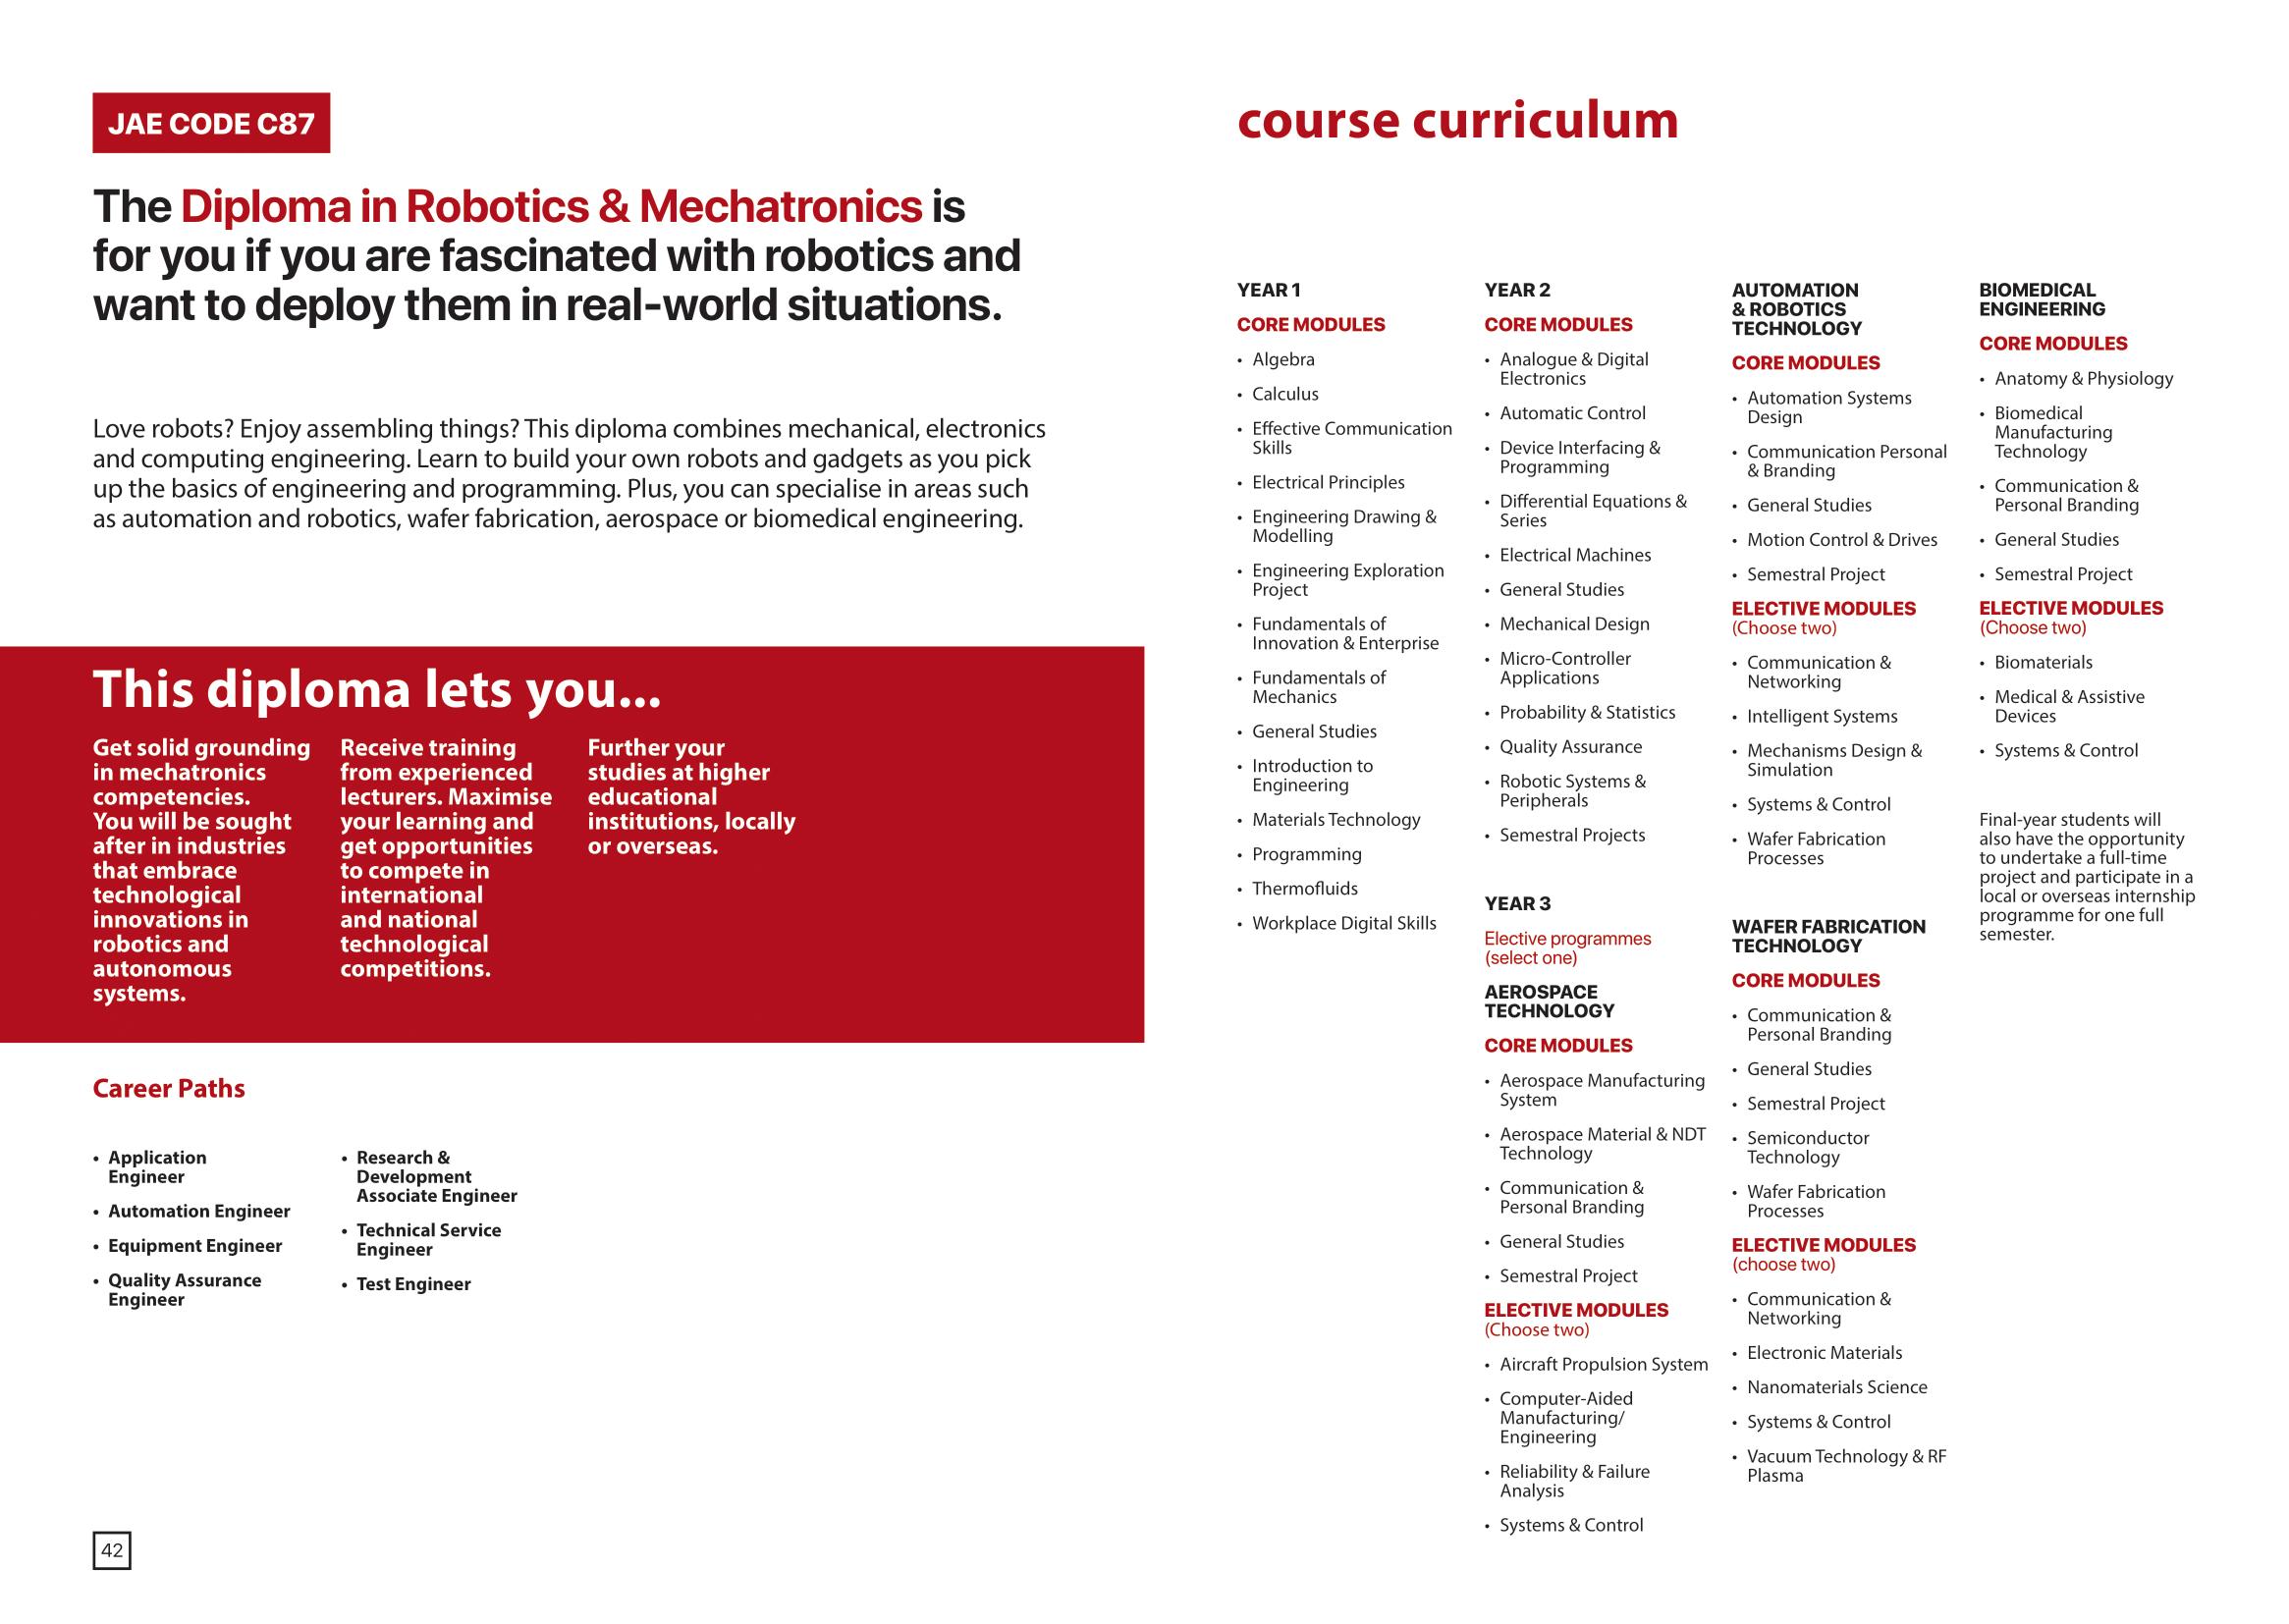 School of Engineering 2020-23